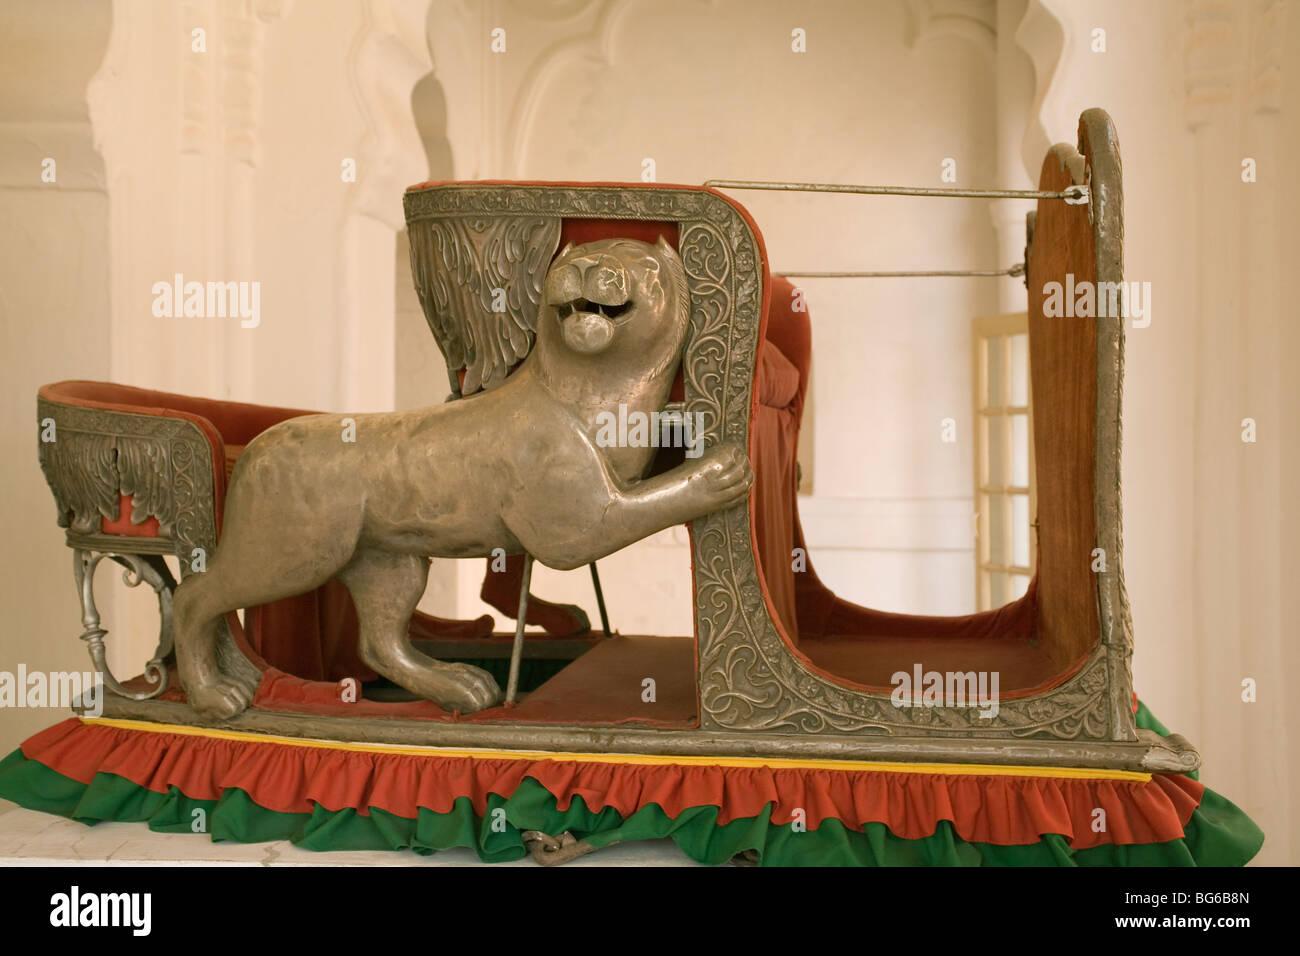 India Rajasthan Jodhpur Meherangarh fort Howdah - Stock Image